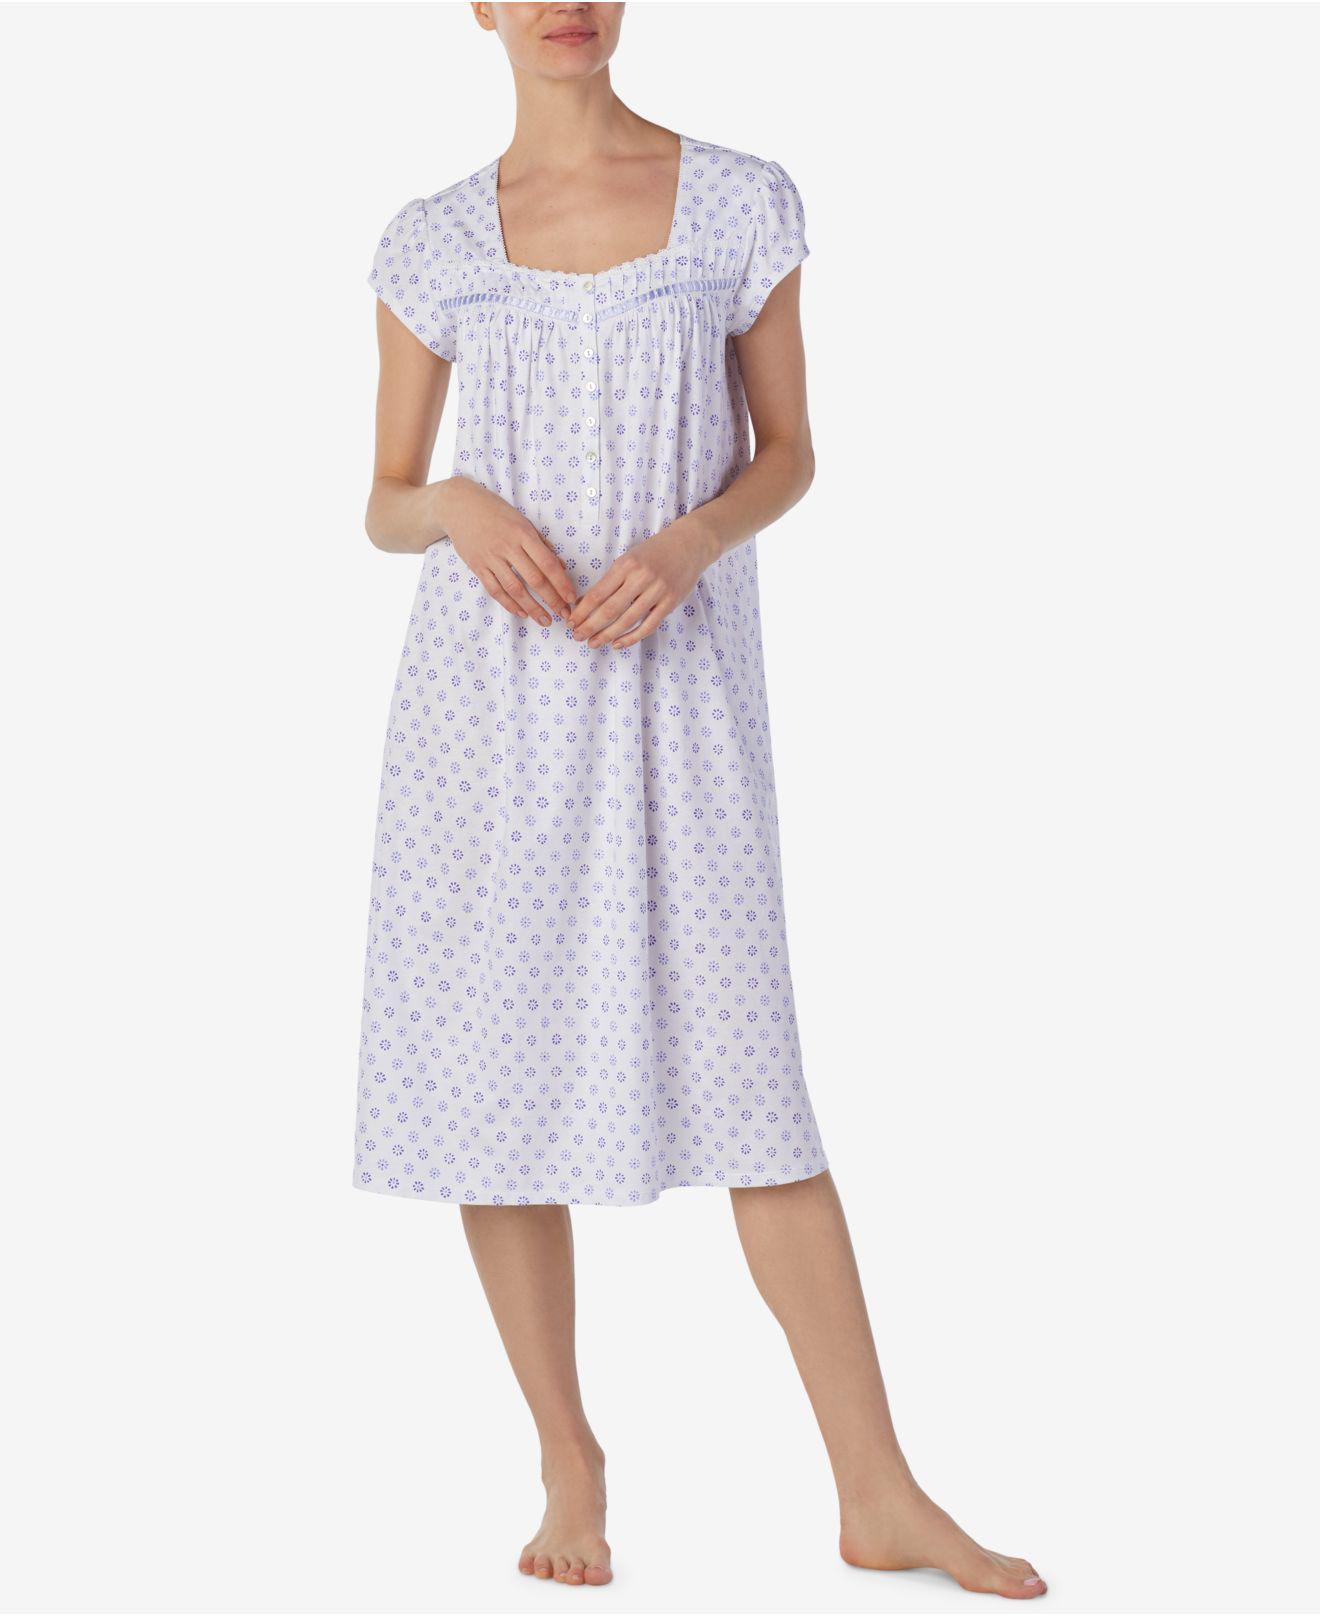 Eileen West Ballet Floral-Print Cotton Knit Nightgown jkUXkn